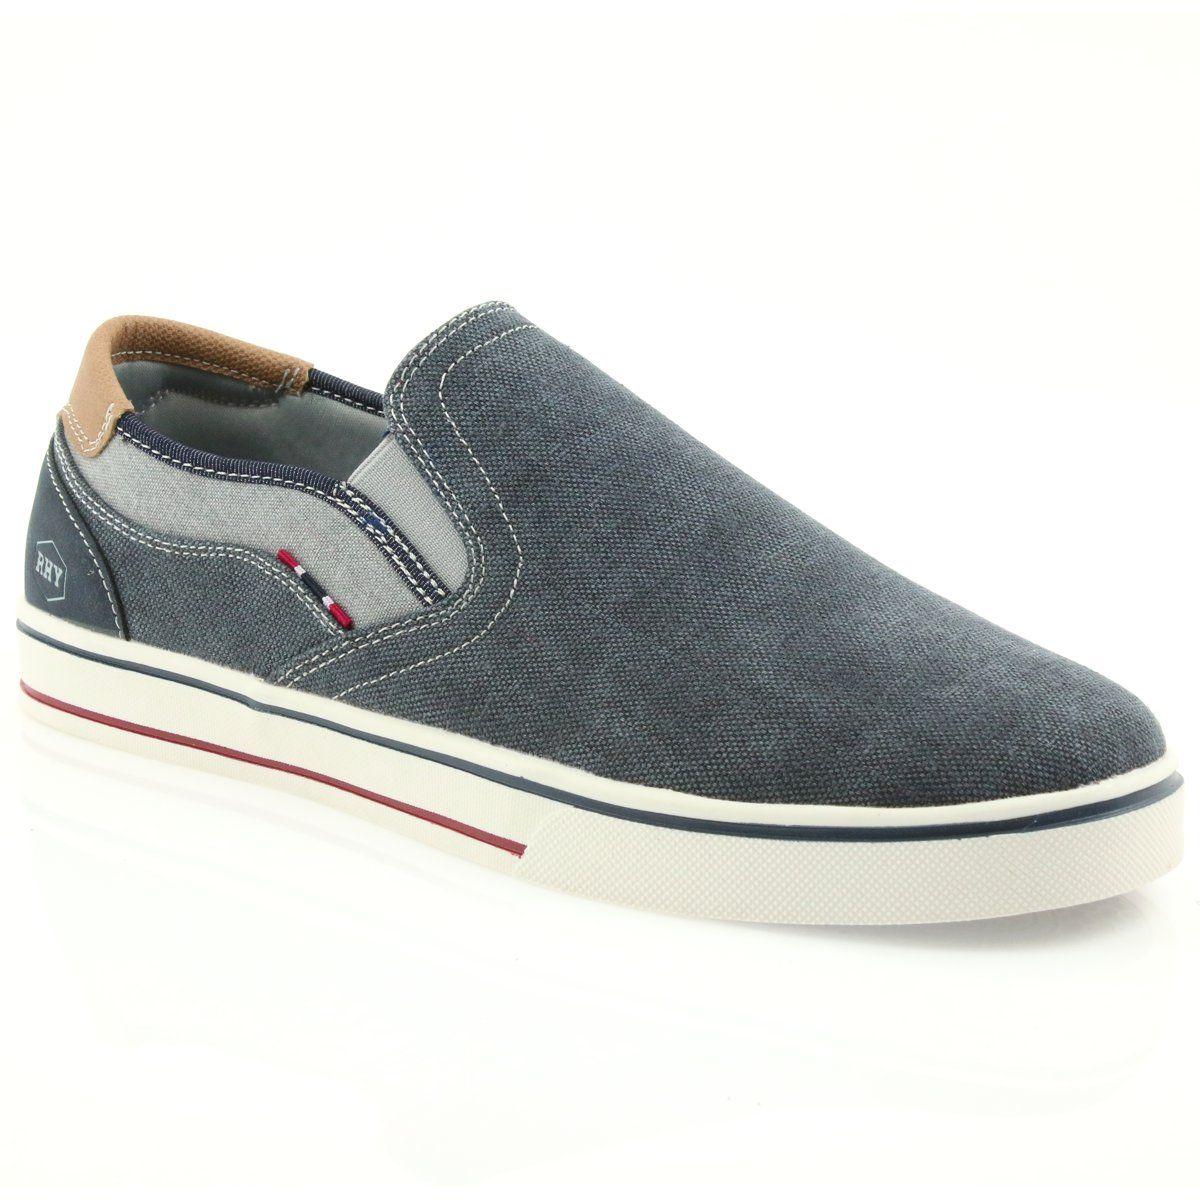 American Club Trampki Tenisowki Buty Meskie Wsuwane Rh13 Granatowe Sneakers Shoes Slip On Sneaker